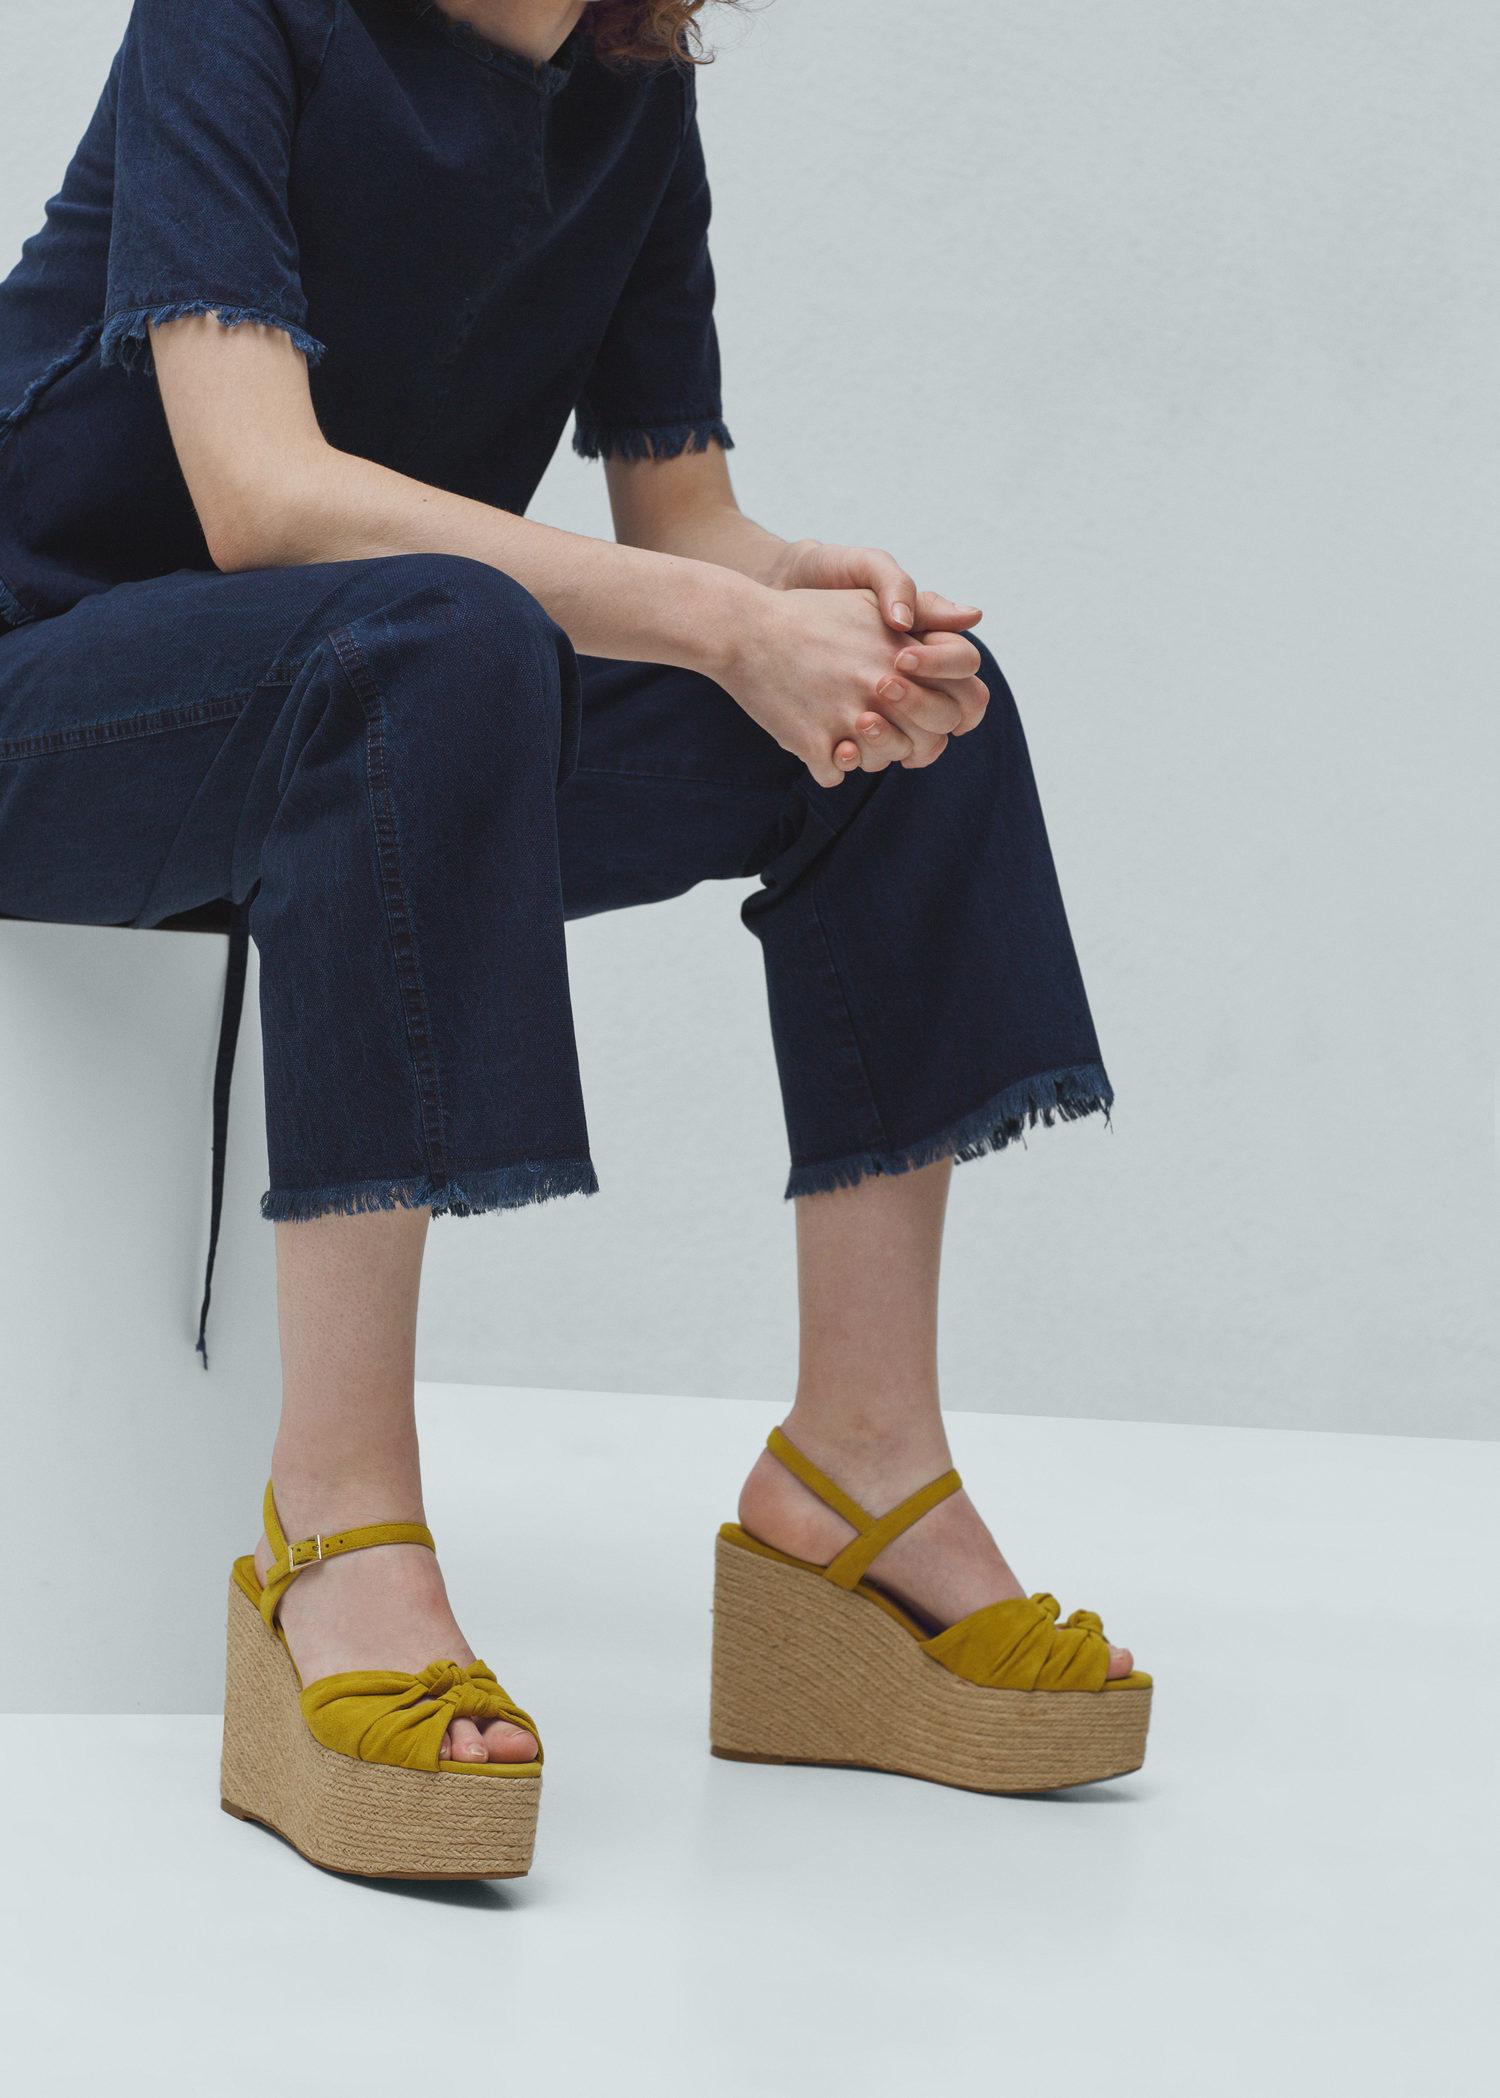 5a8258c93c7 Mango Yellow Platform Leather Sandals